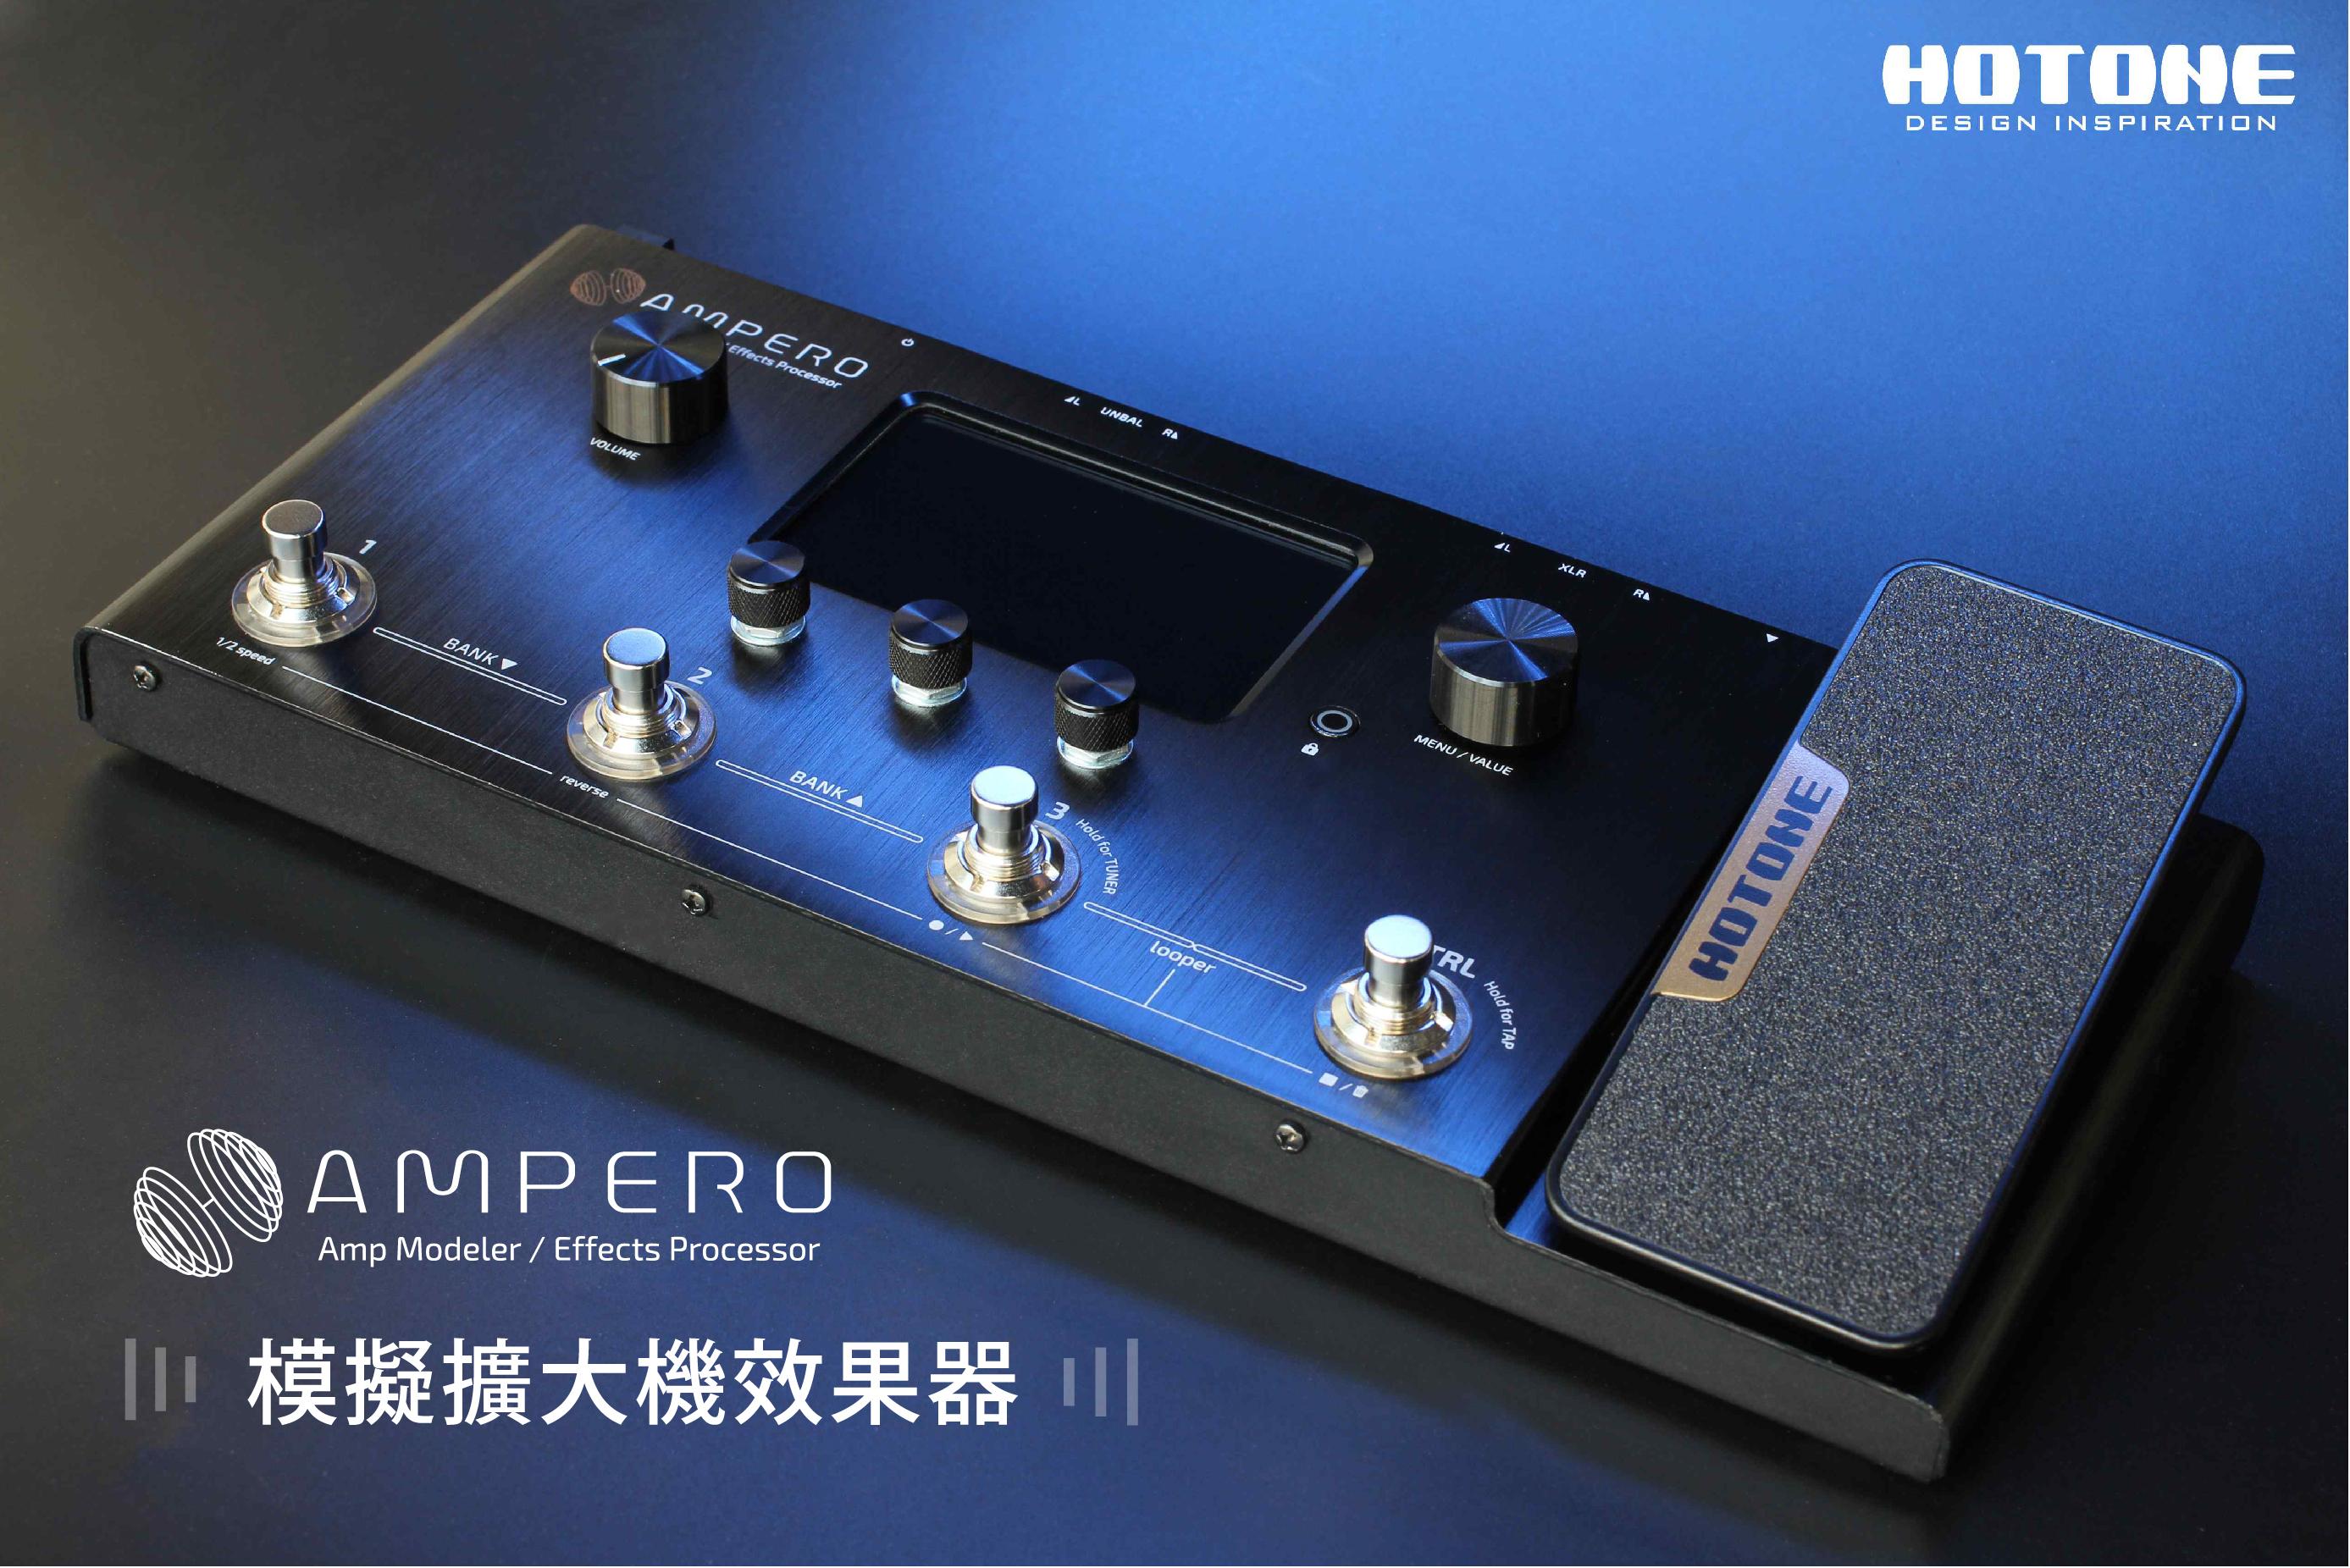 Hotone AMPERO 擴大機模擬 吉他效果器